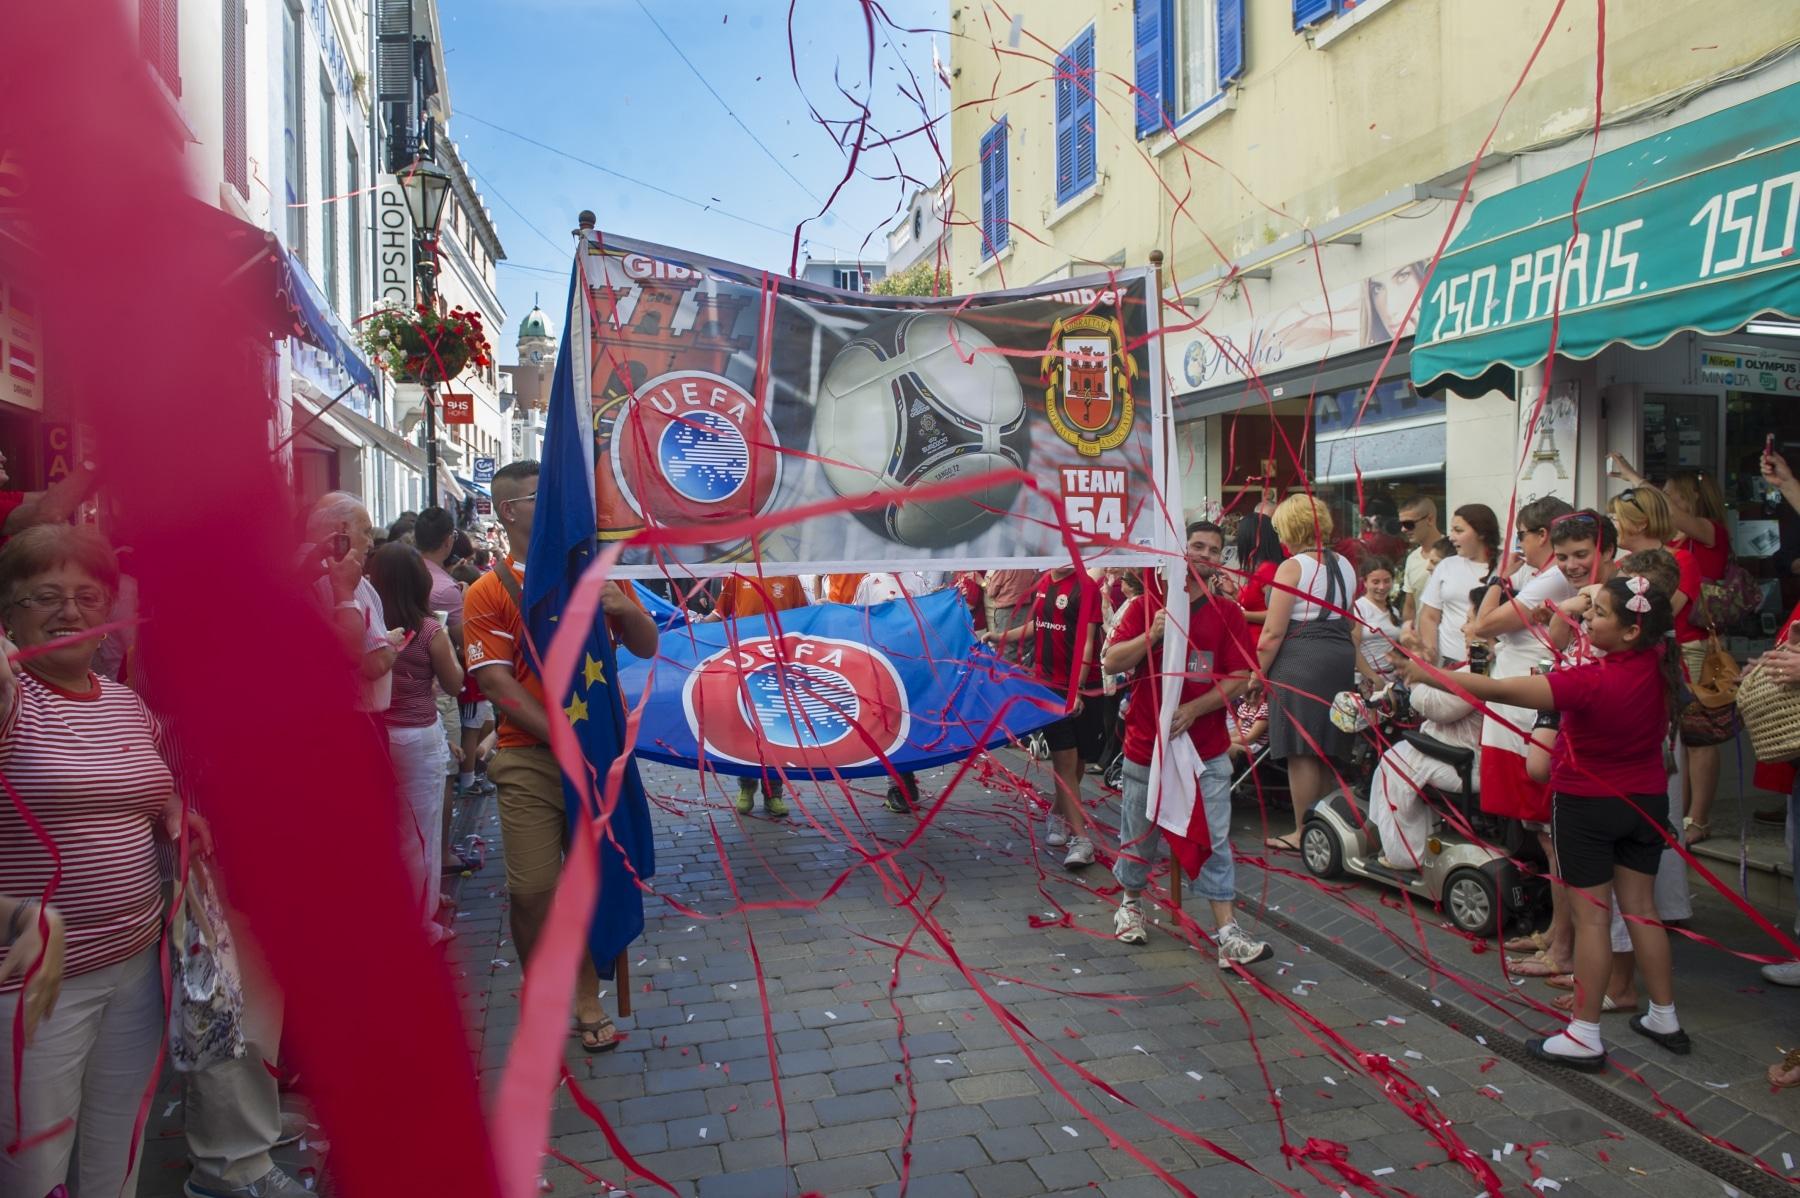 celebracin-entrada-gibraltar-en-la-uefa-04_9224808220_o